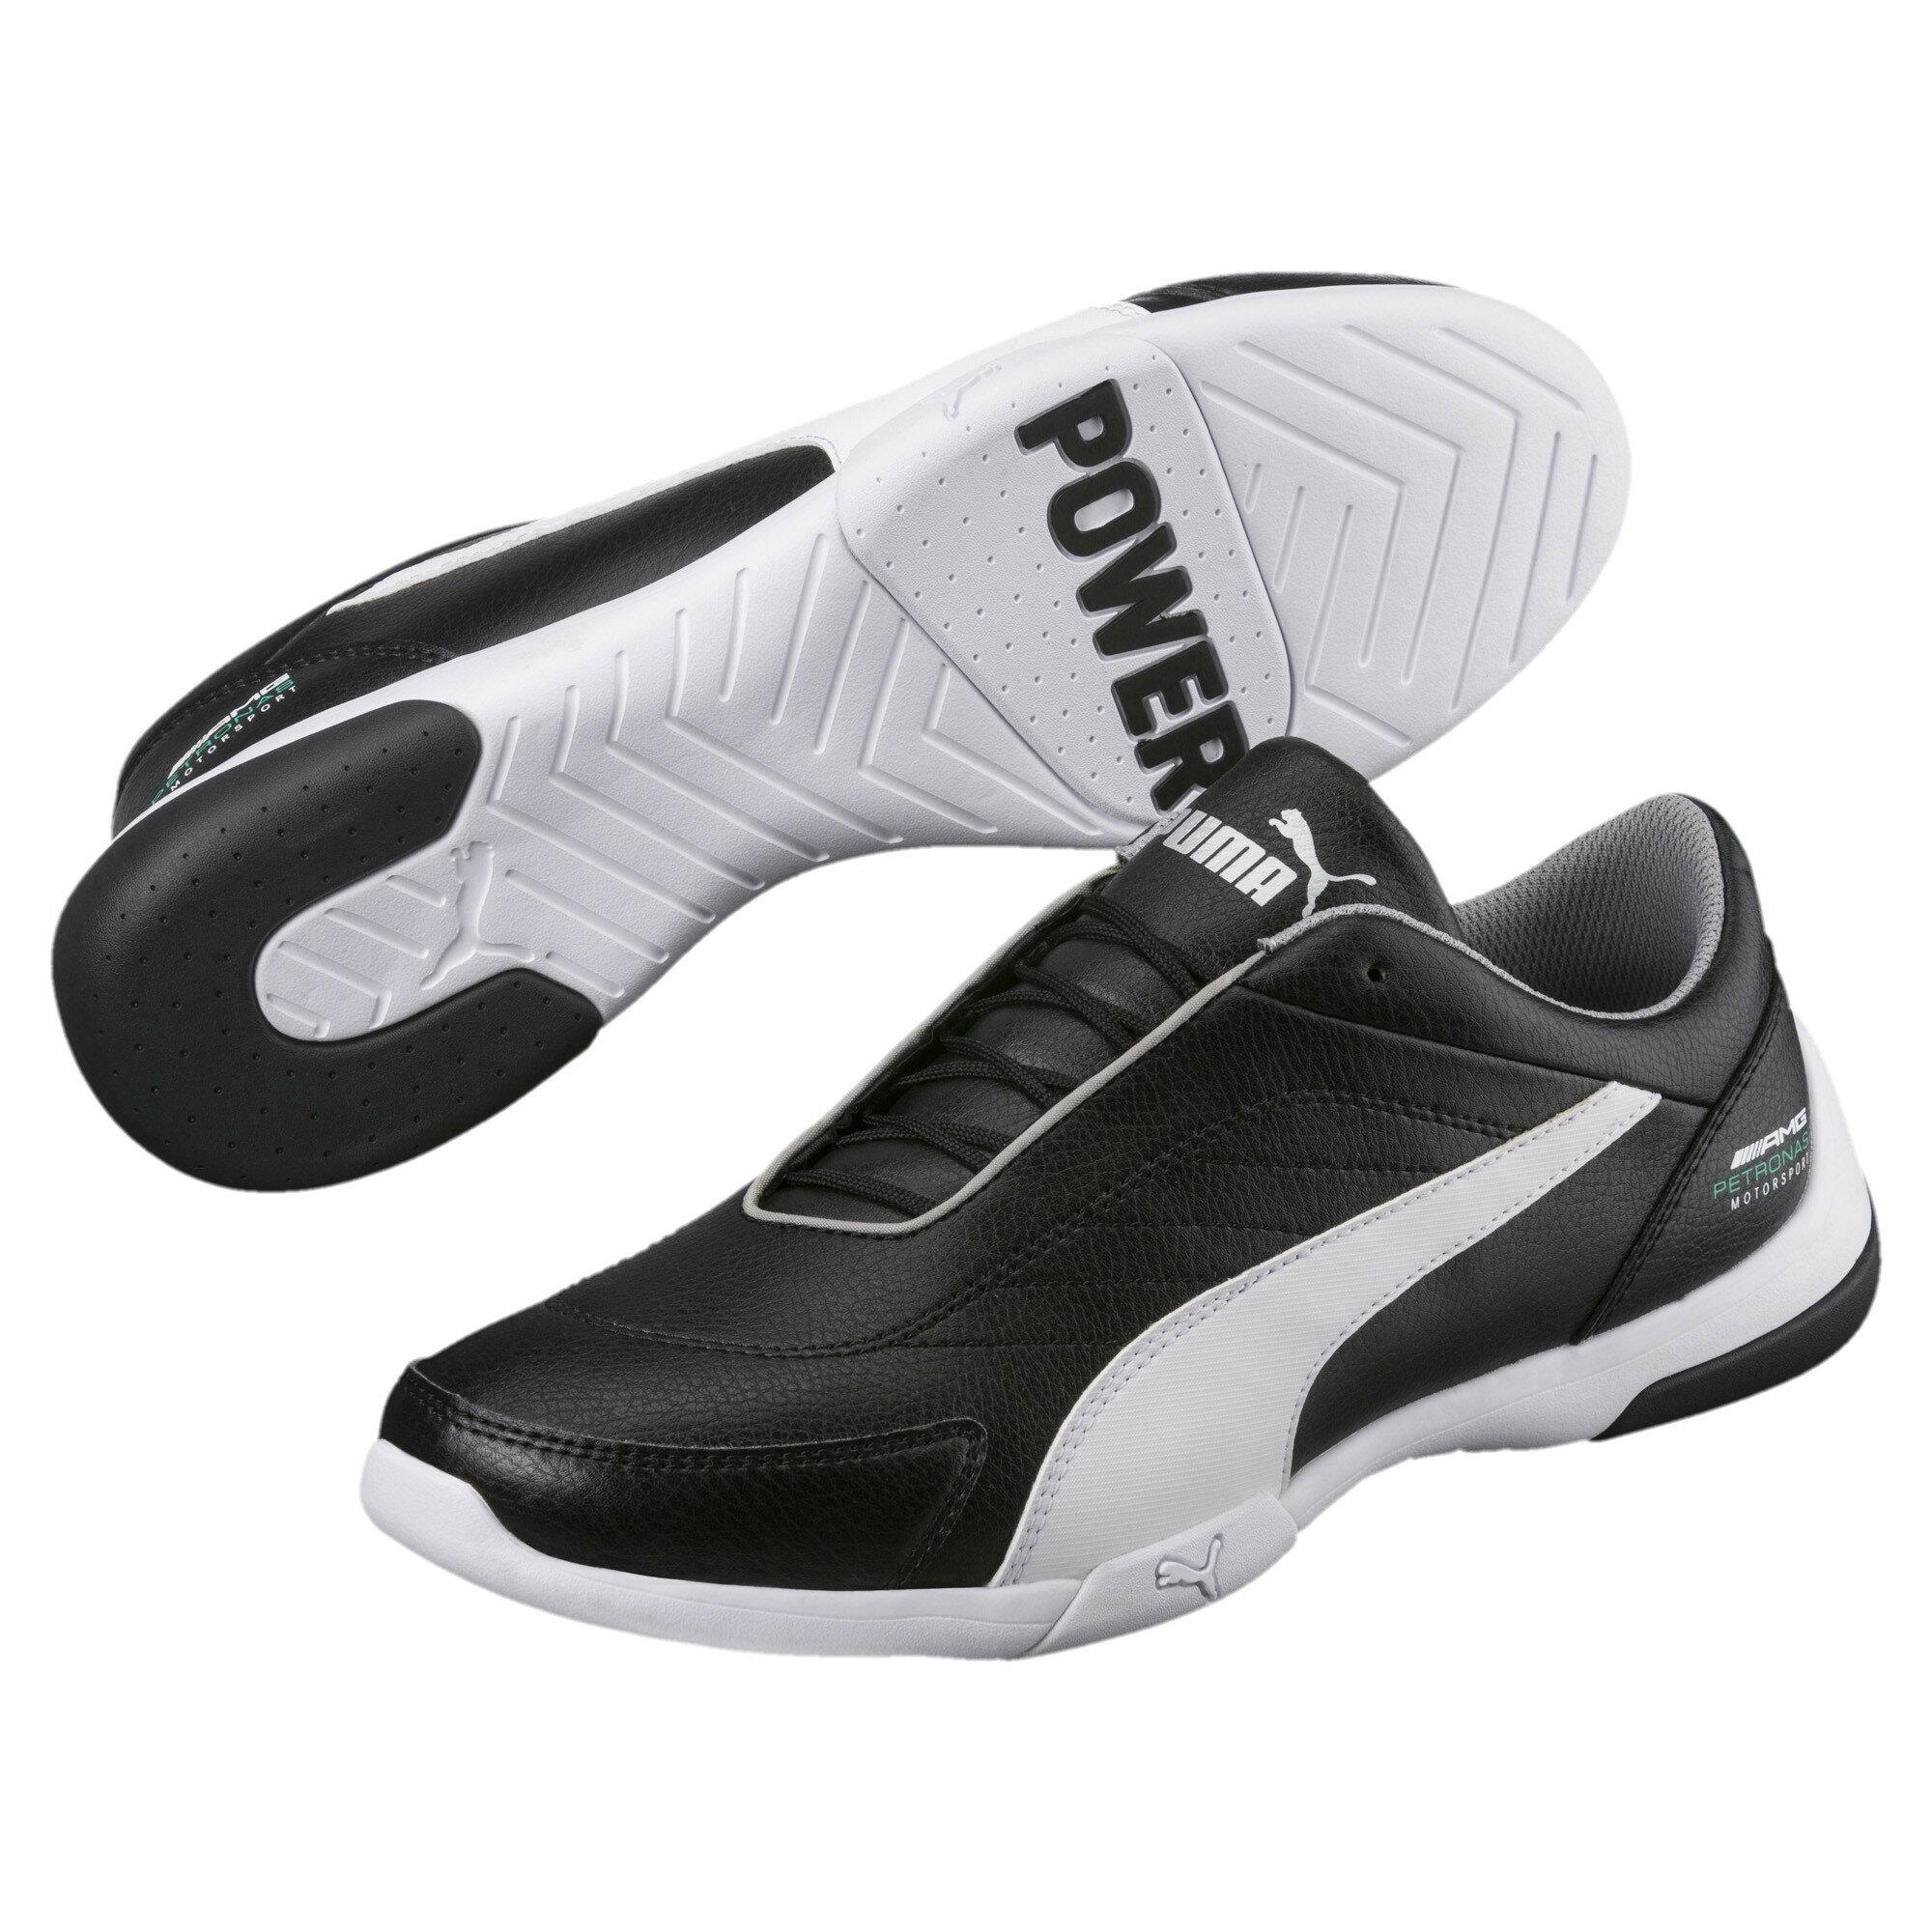 Puma Sneakers Australia Puma Mercedes Amg Petronas Court